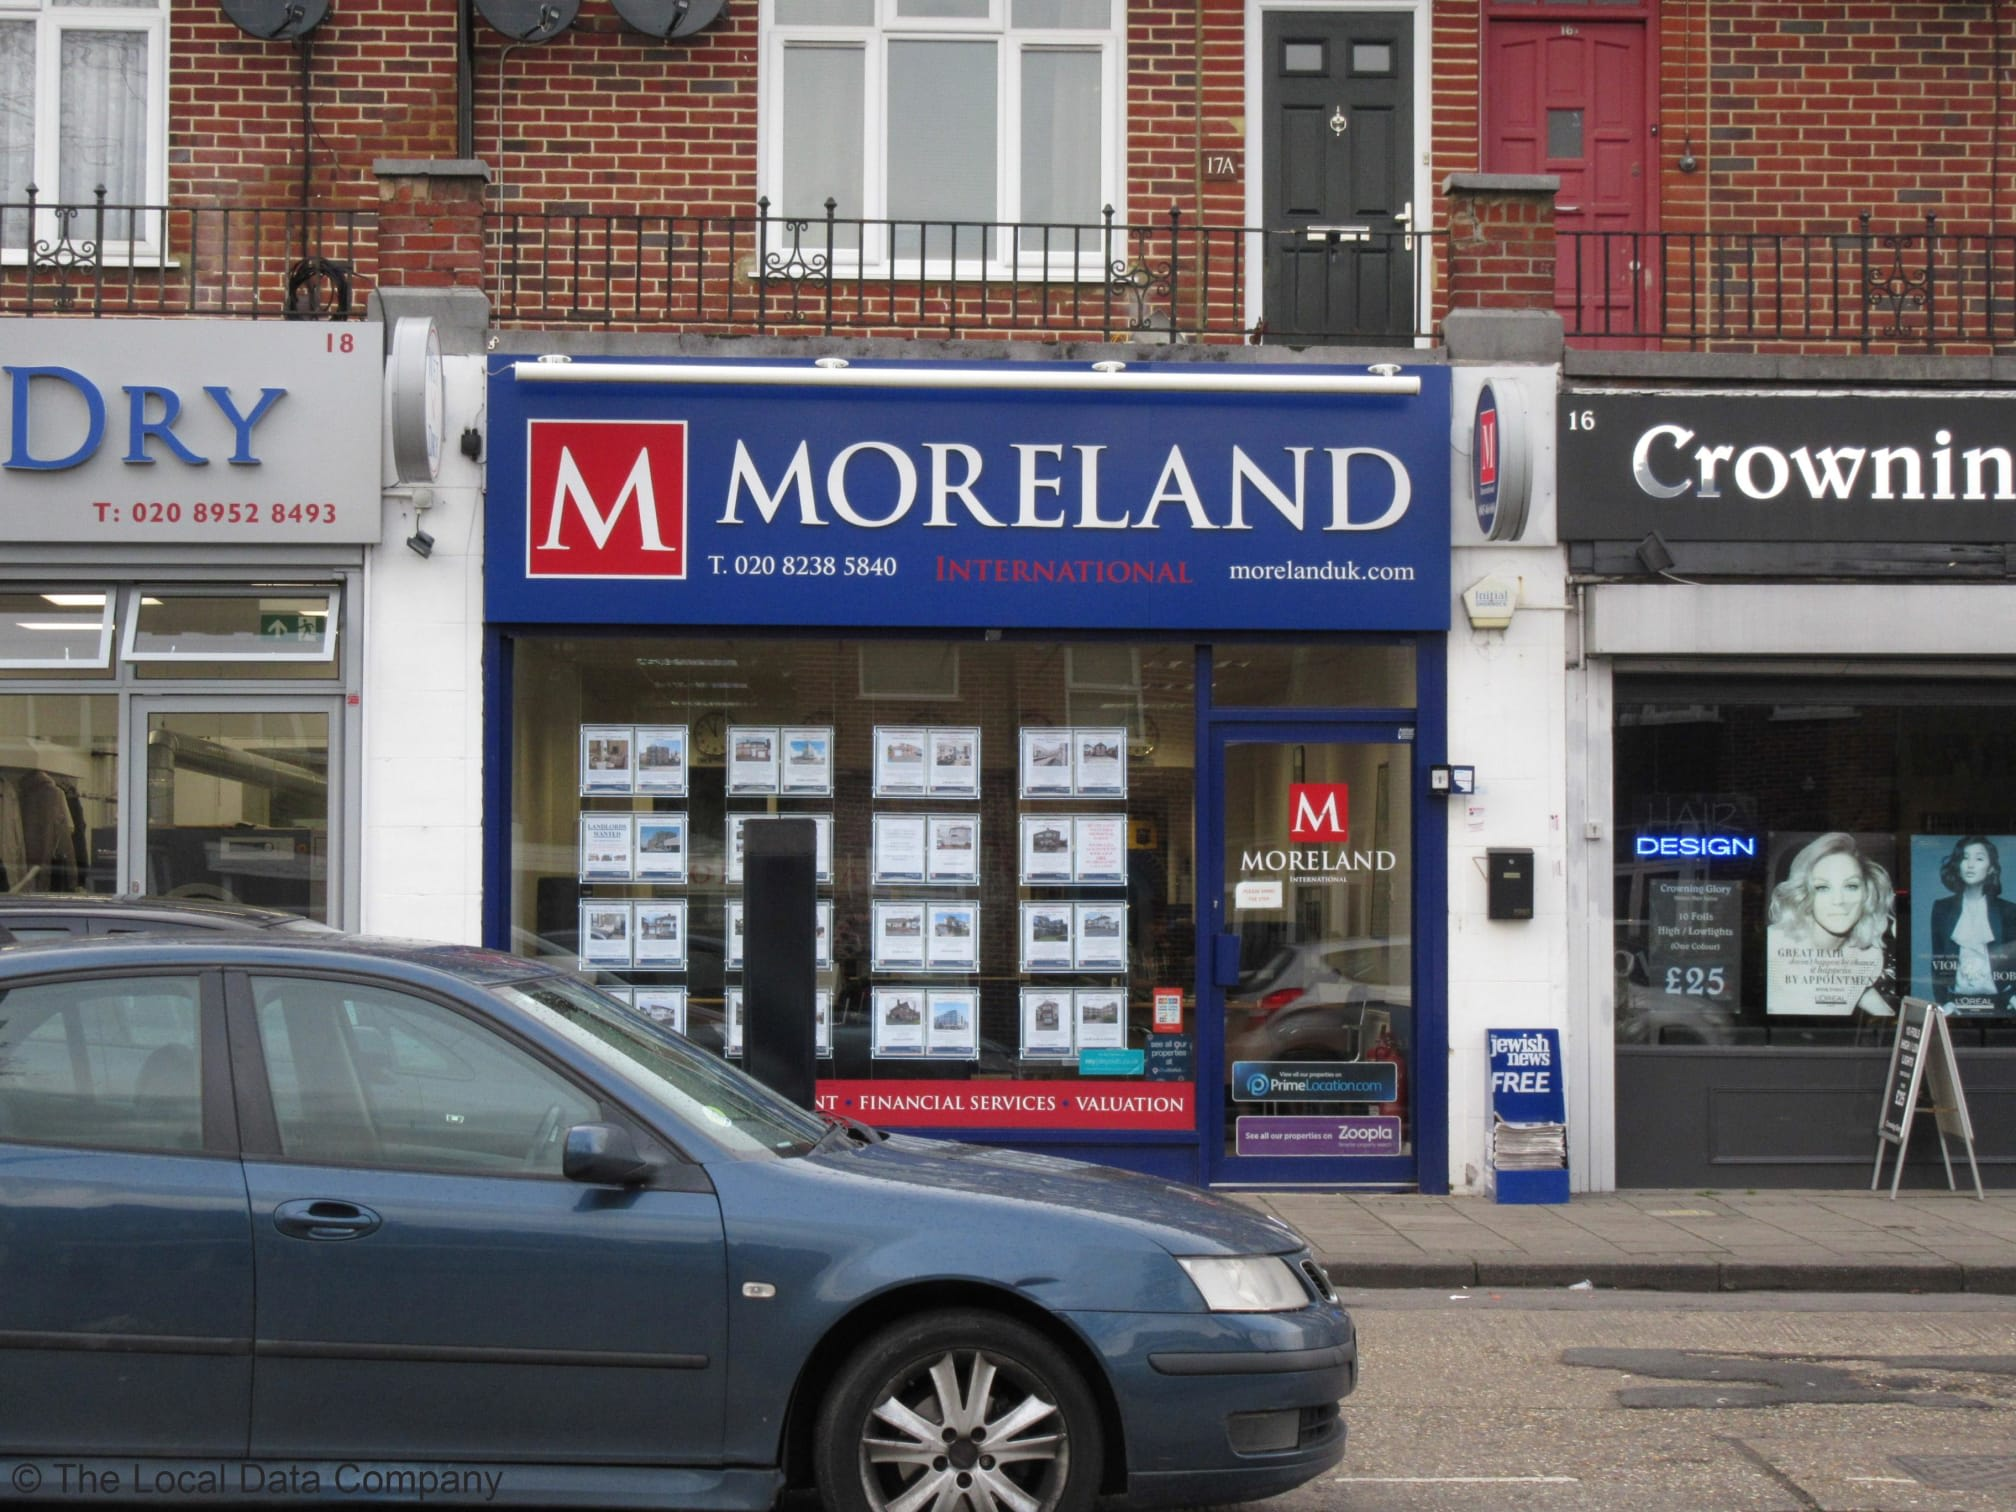 Moreland International